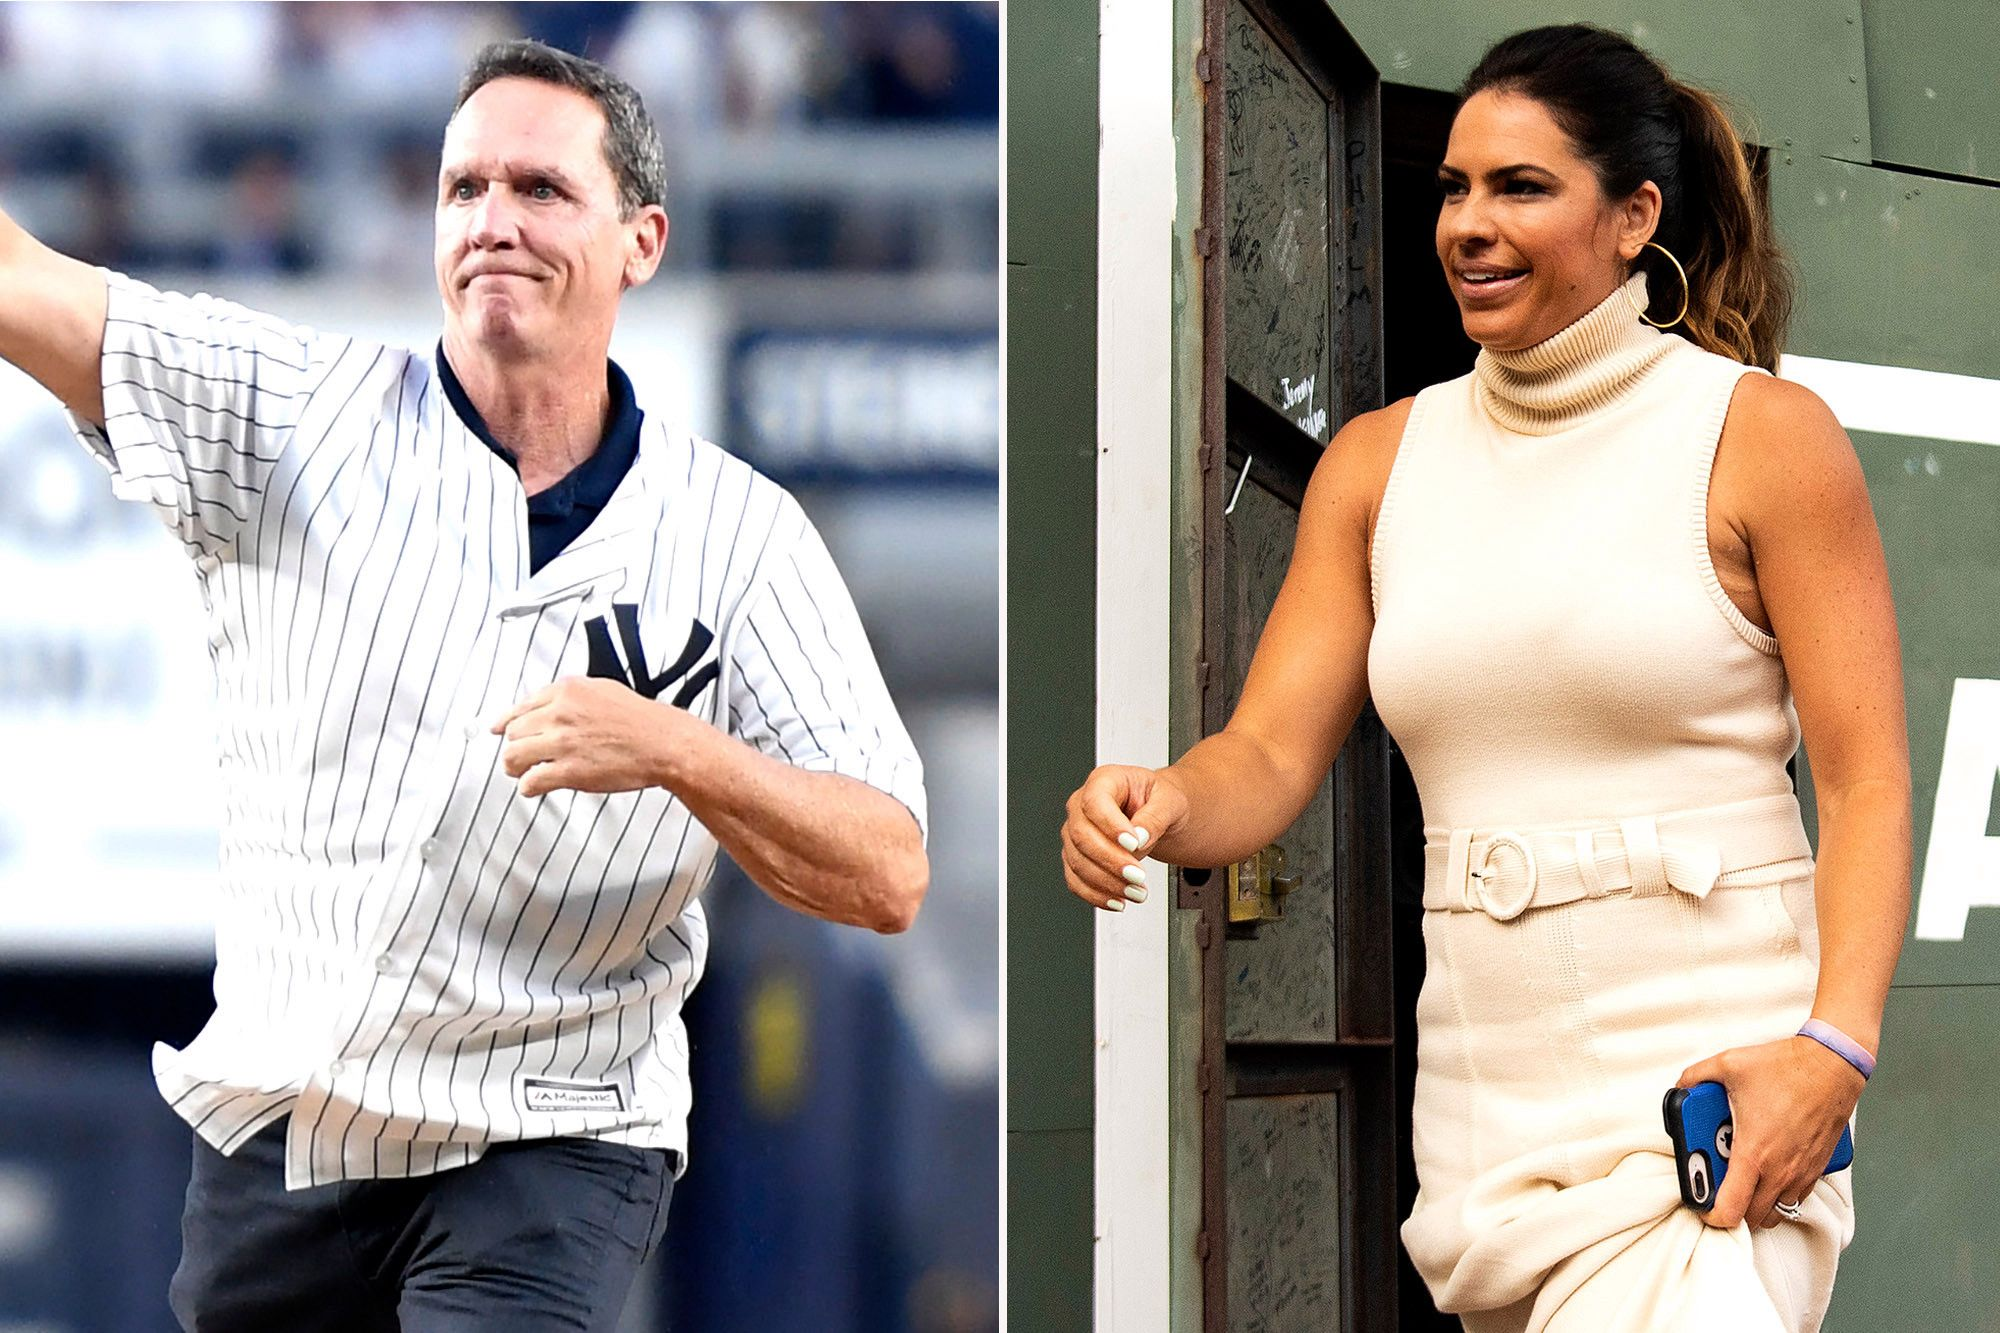 Espn Eyeing Ex Yankee With Jessica Mendoza S Spot In Limbo Major League Baseball News Http Mlb Nbanewsno In 2020 Major League Baseball Major League Jessica Mendoza